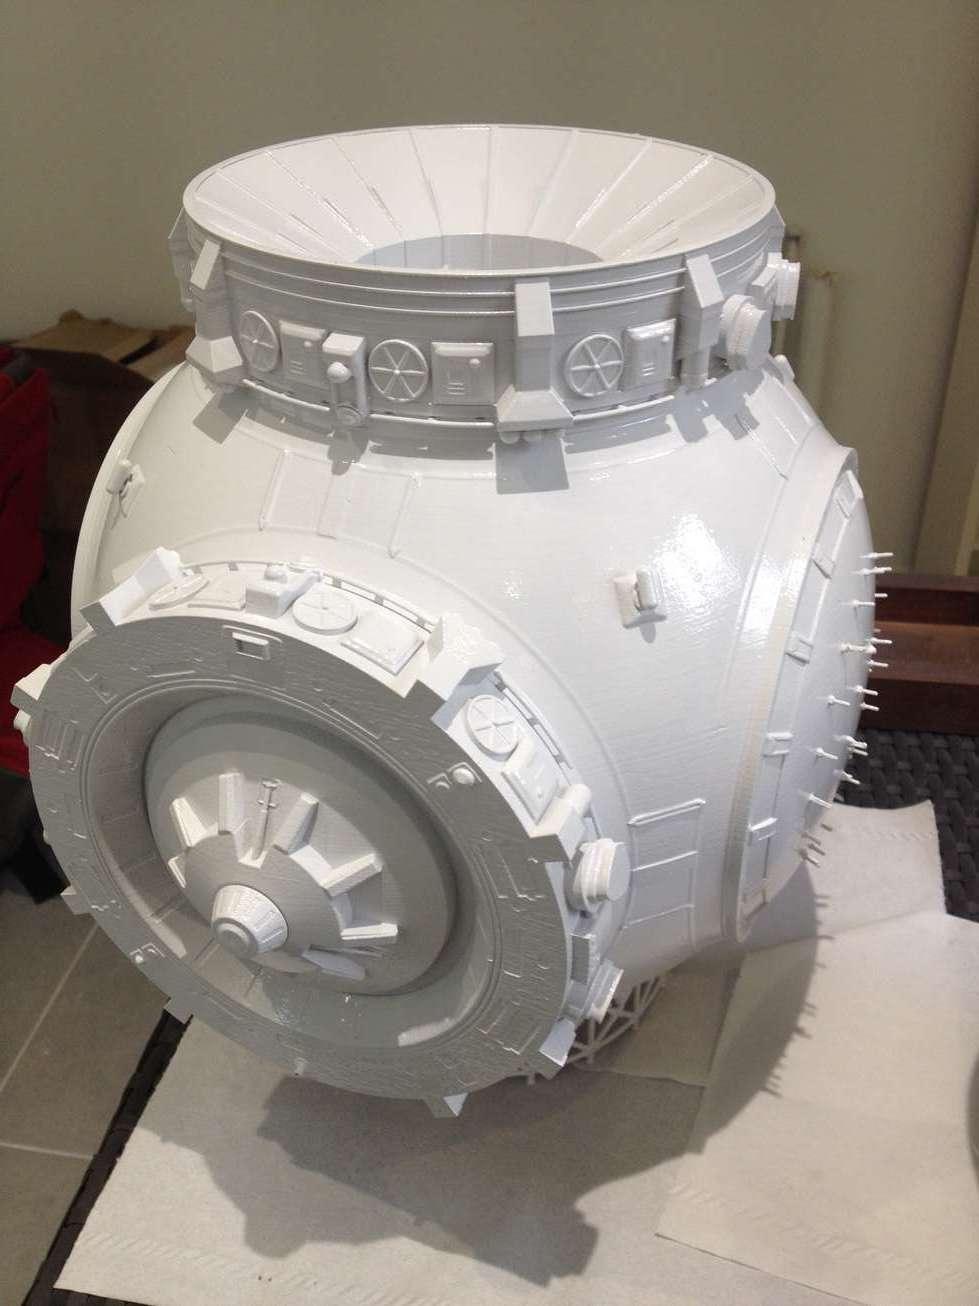 impression-3-d-prototype-satellite-restaurarte-retouche-peinture -retouche-vernis.jpg